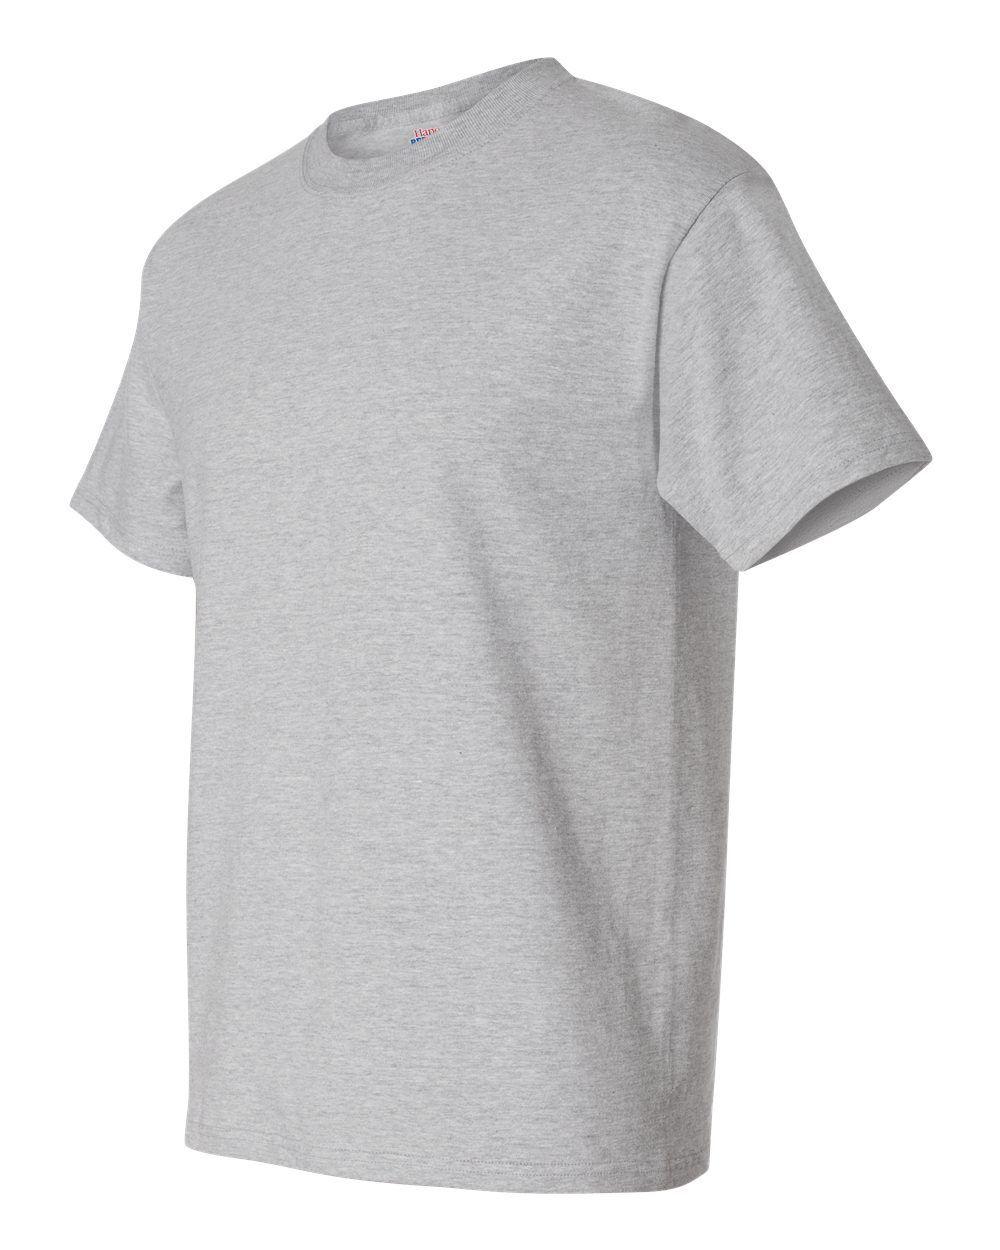 53cb0ff743 Hanes Beefy-T TALL TAGLESS T-Shirt 100% Cotton 518T Mens LT XLT 2XLT 3XLT  4XLT. Click to Enlarge